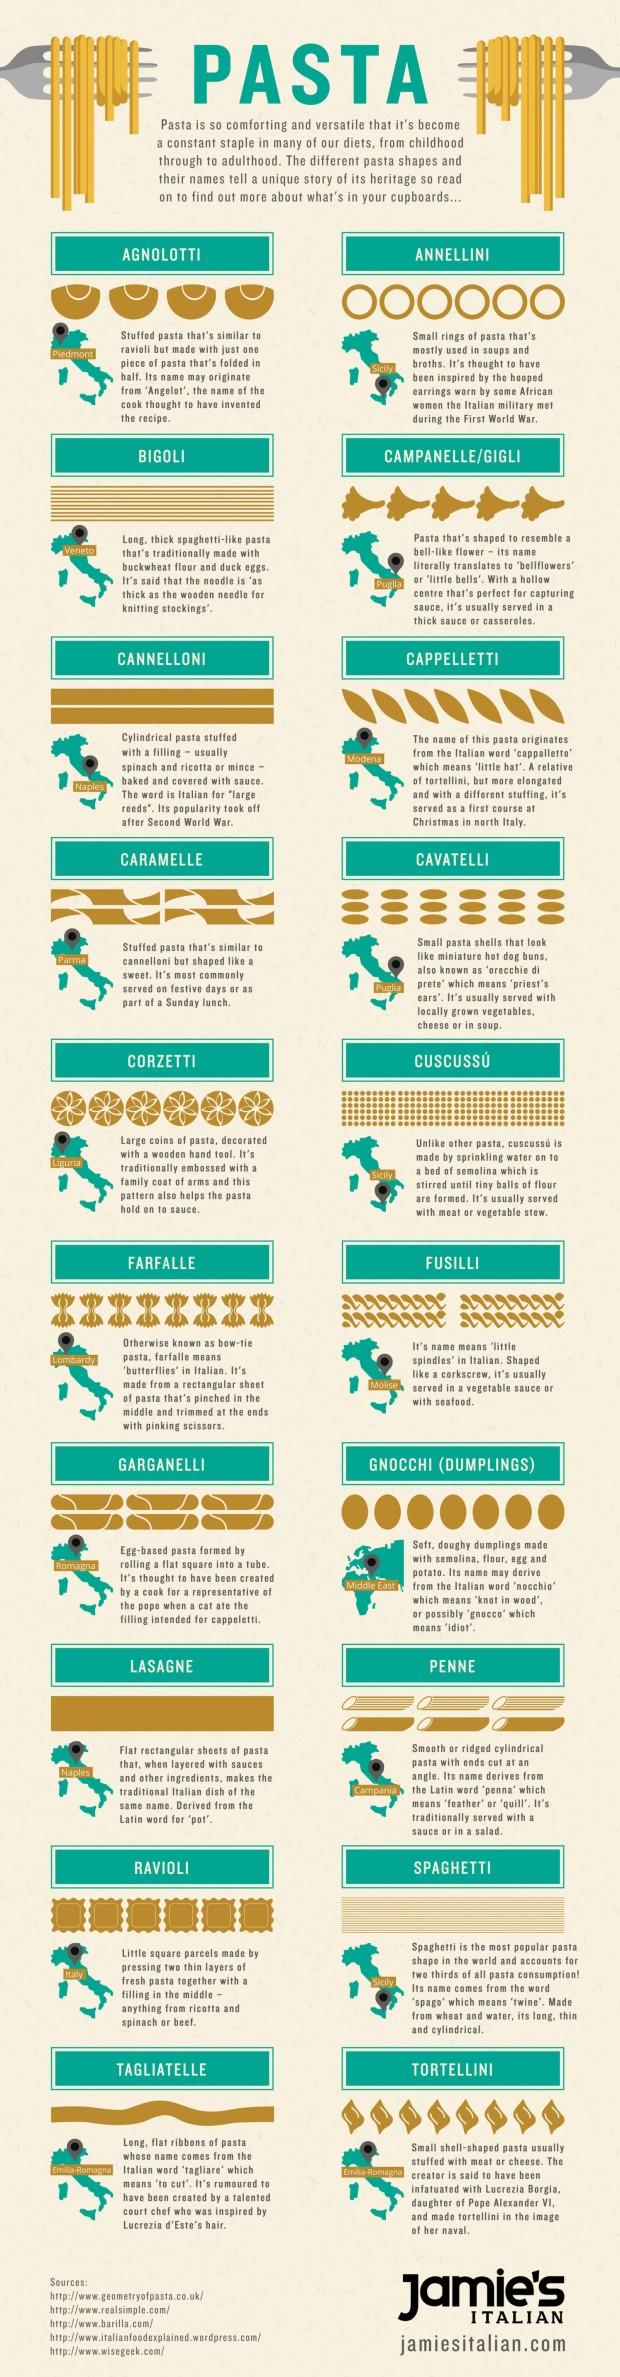 jamies-italian-pasta-infographic_560418fadaabe_w1500